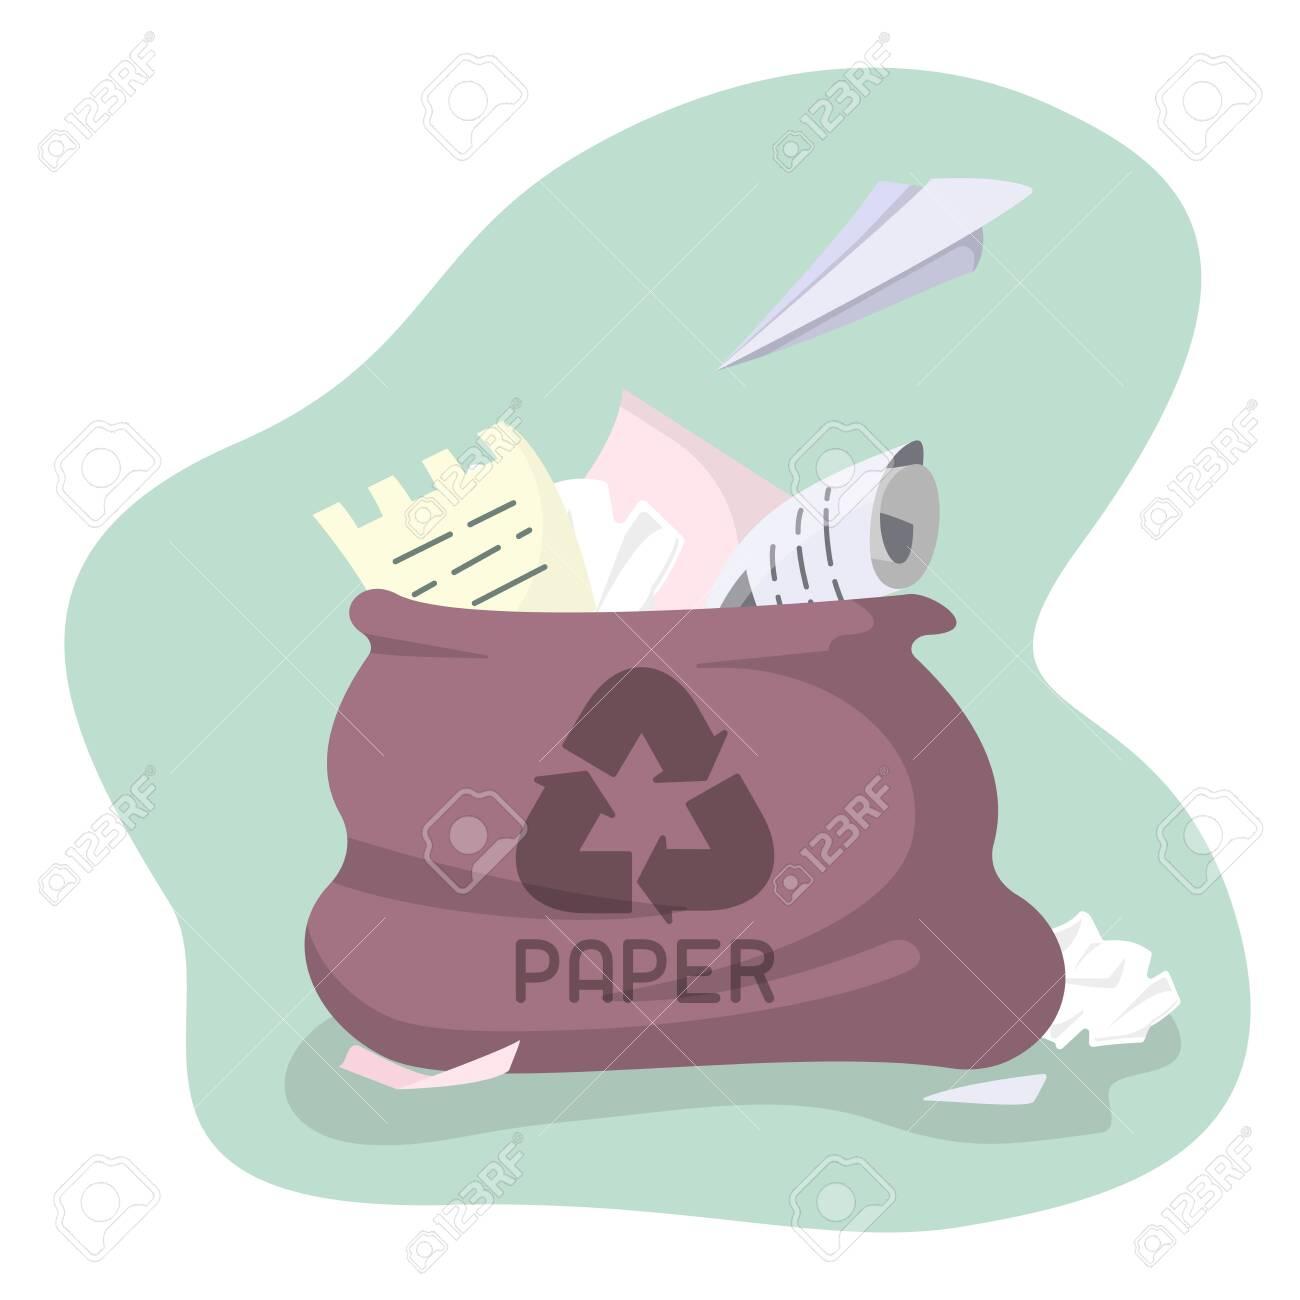 Waste paper bag. Flat style vector illustration - 129013202